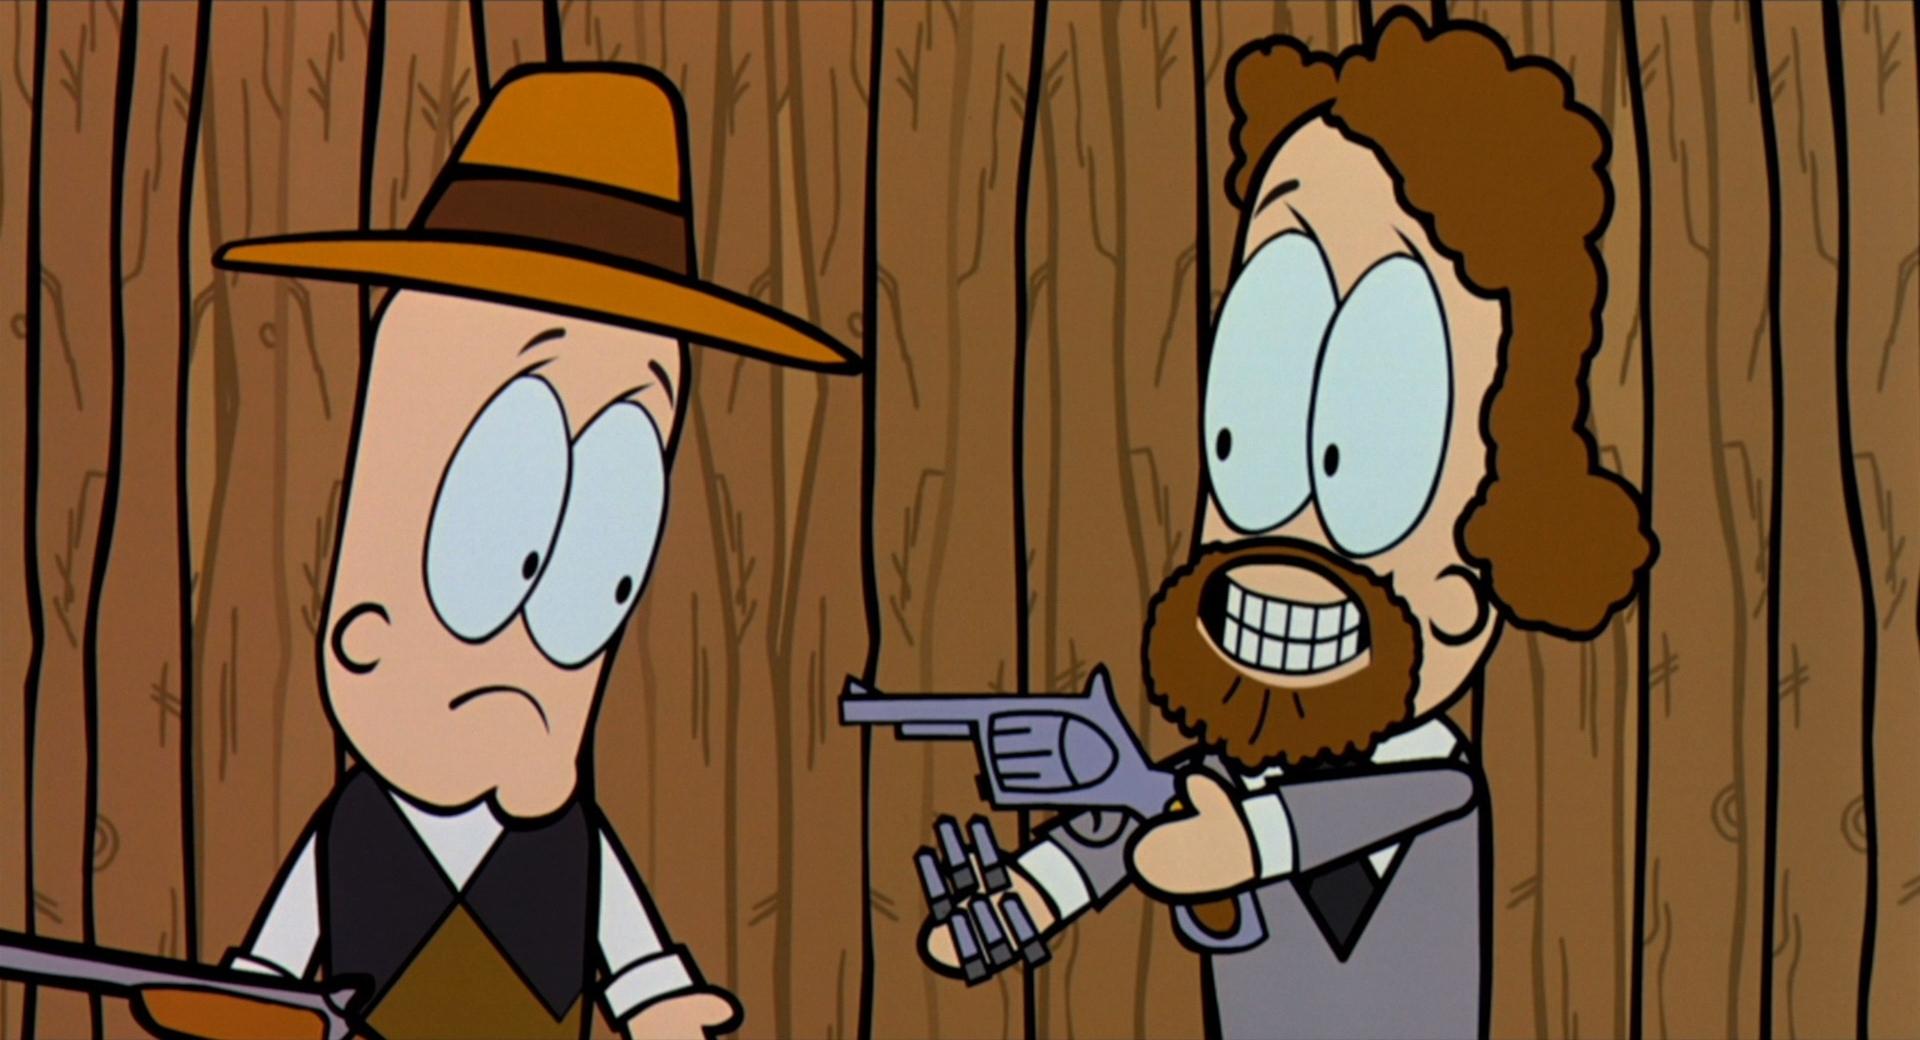 Bowling for Columbine - Cartoon Interlude